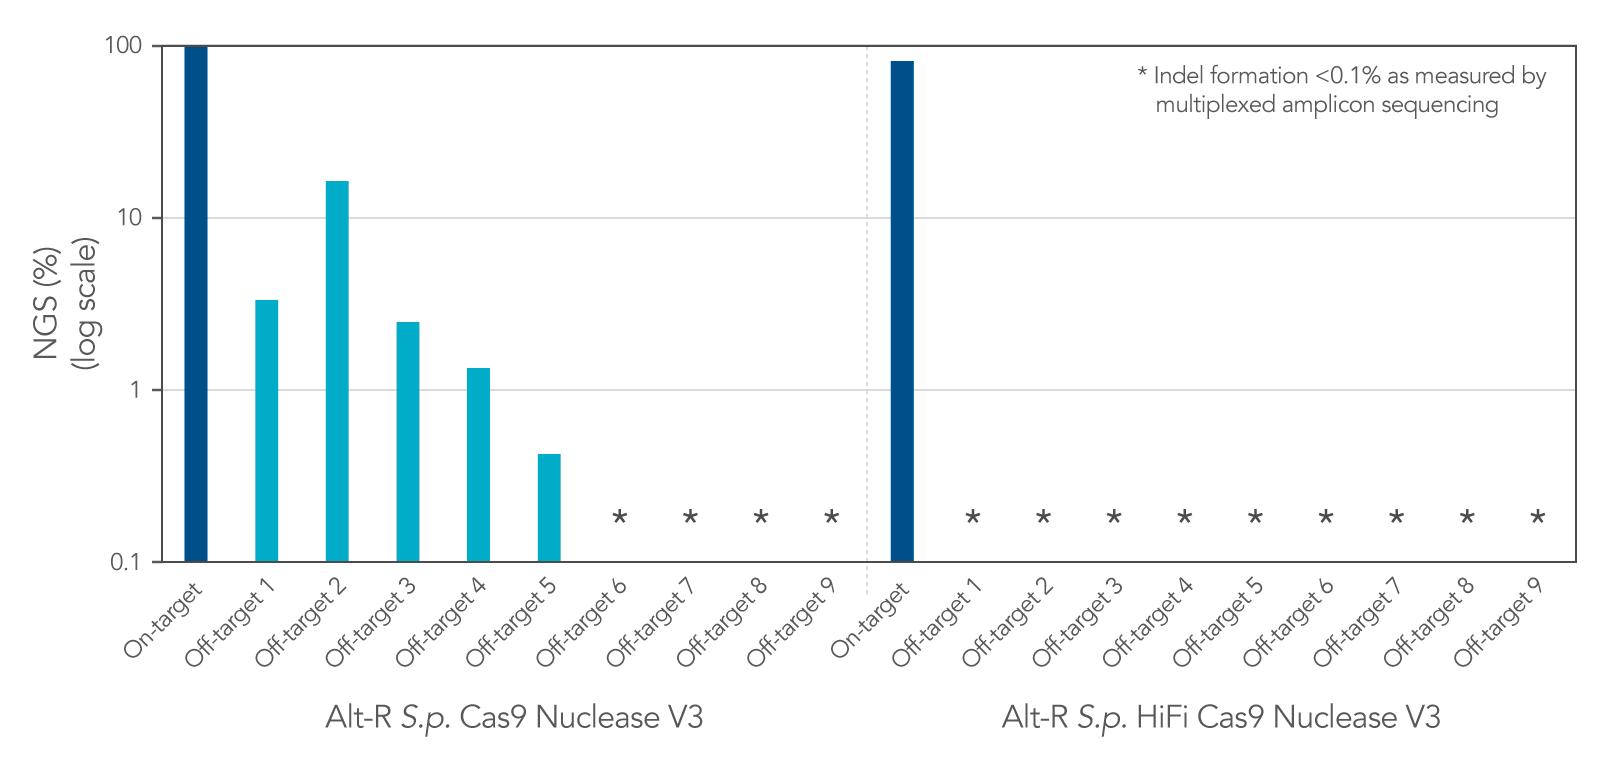 alt-r-hifi-cas9-similar-editing-efficiency-to-wild-type-cas9-v4